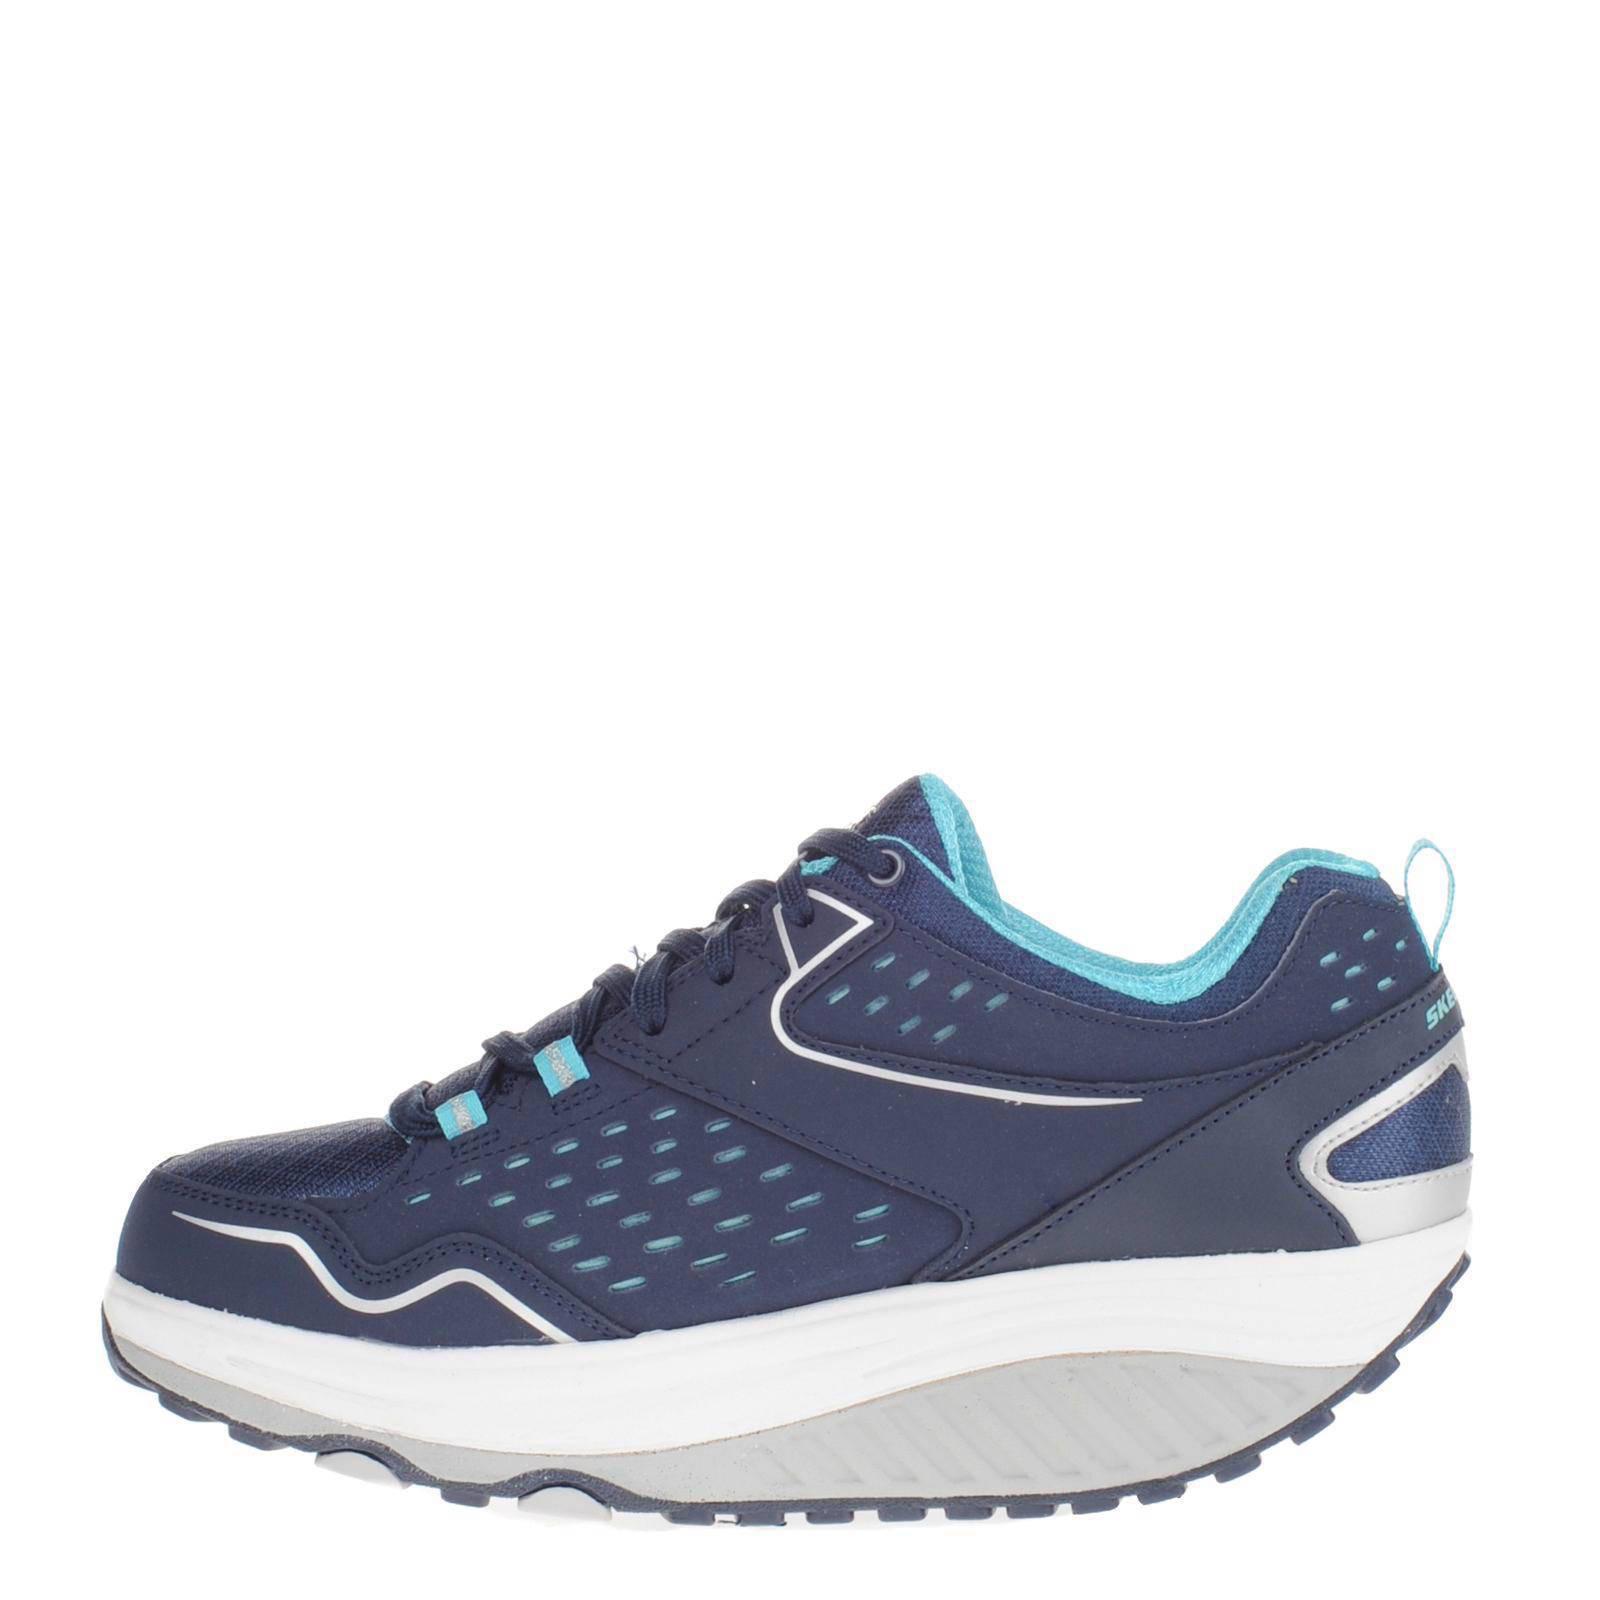 c0c9e8f00 Skechers shape ups sneakers wehkamp jpg 1600x1600 Skechers shape ups